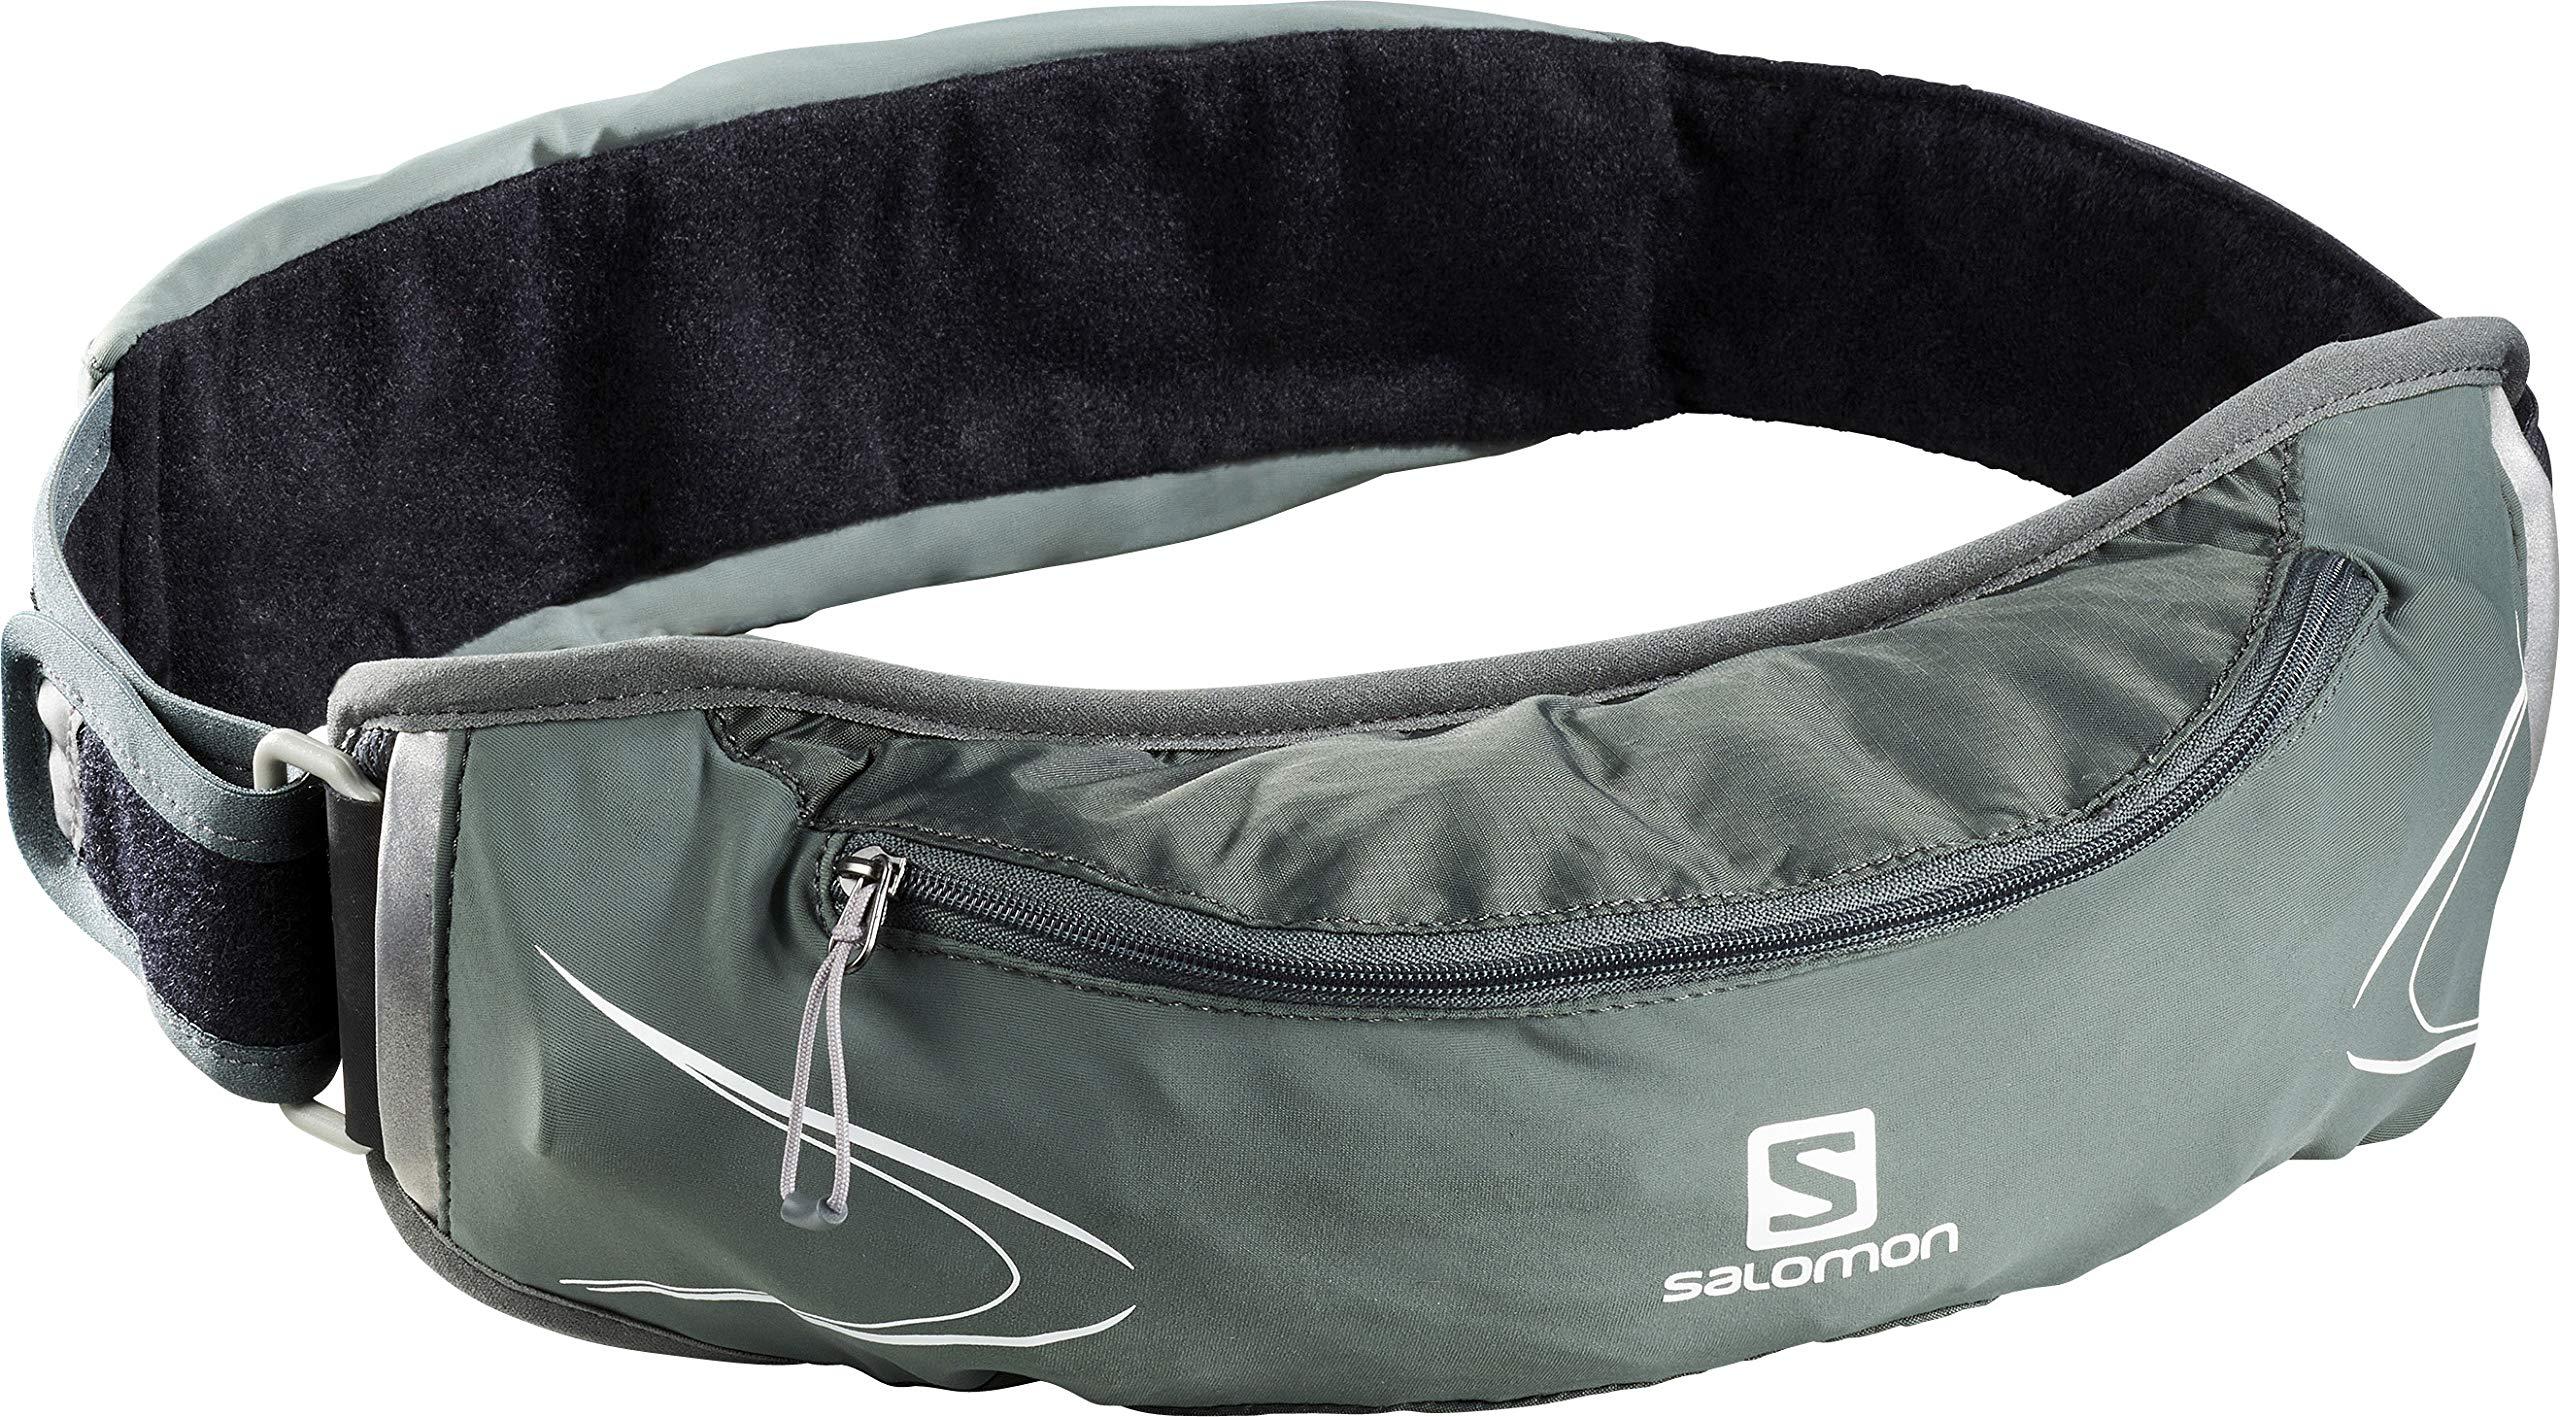 Salomon Agile 500 Belt Set - Urban Chic